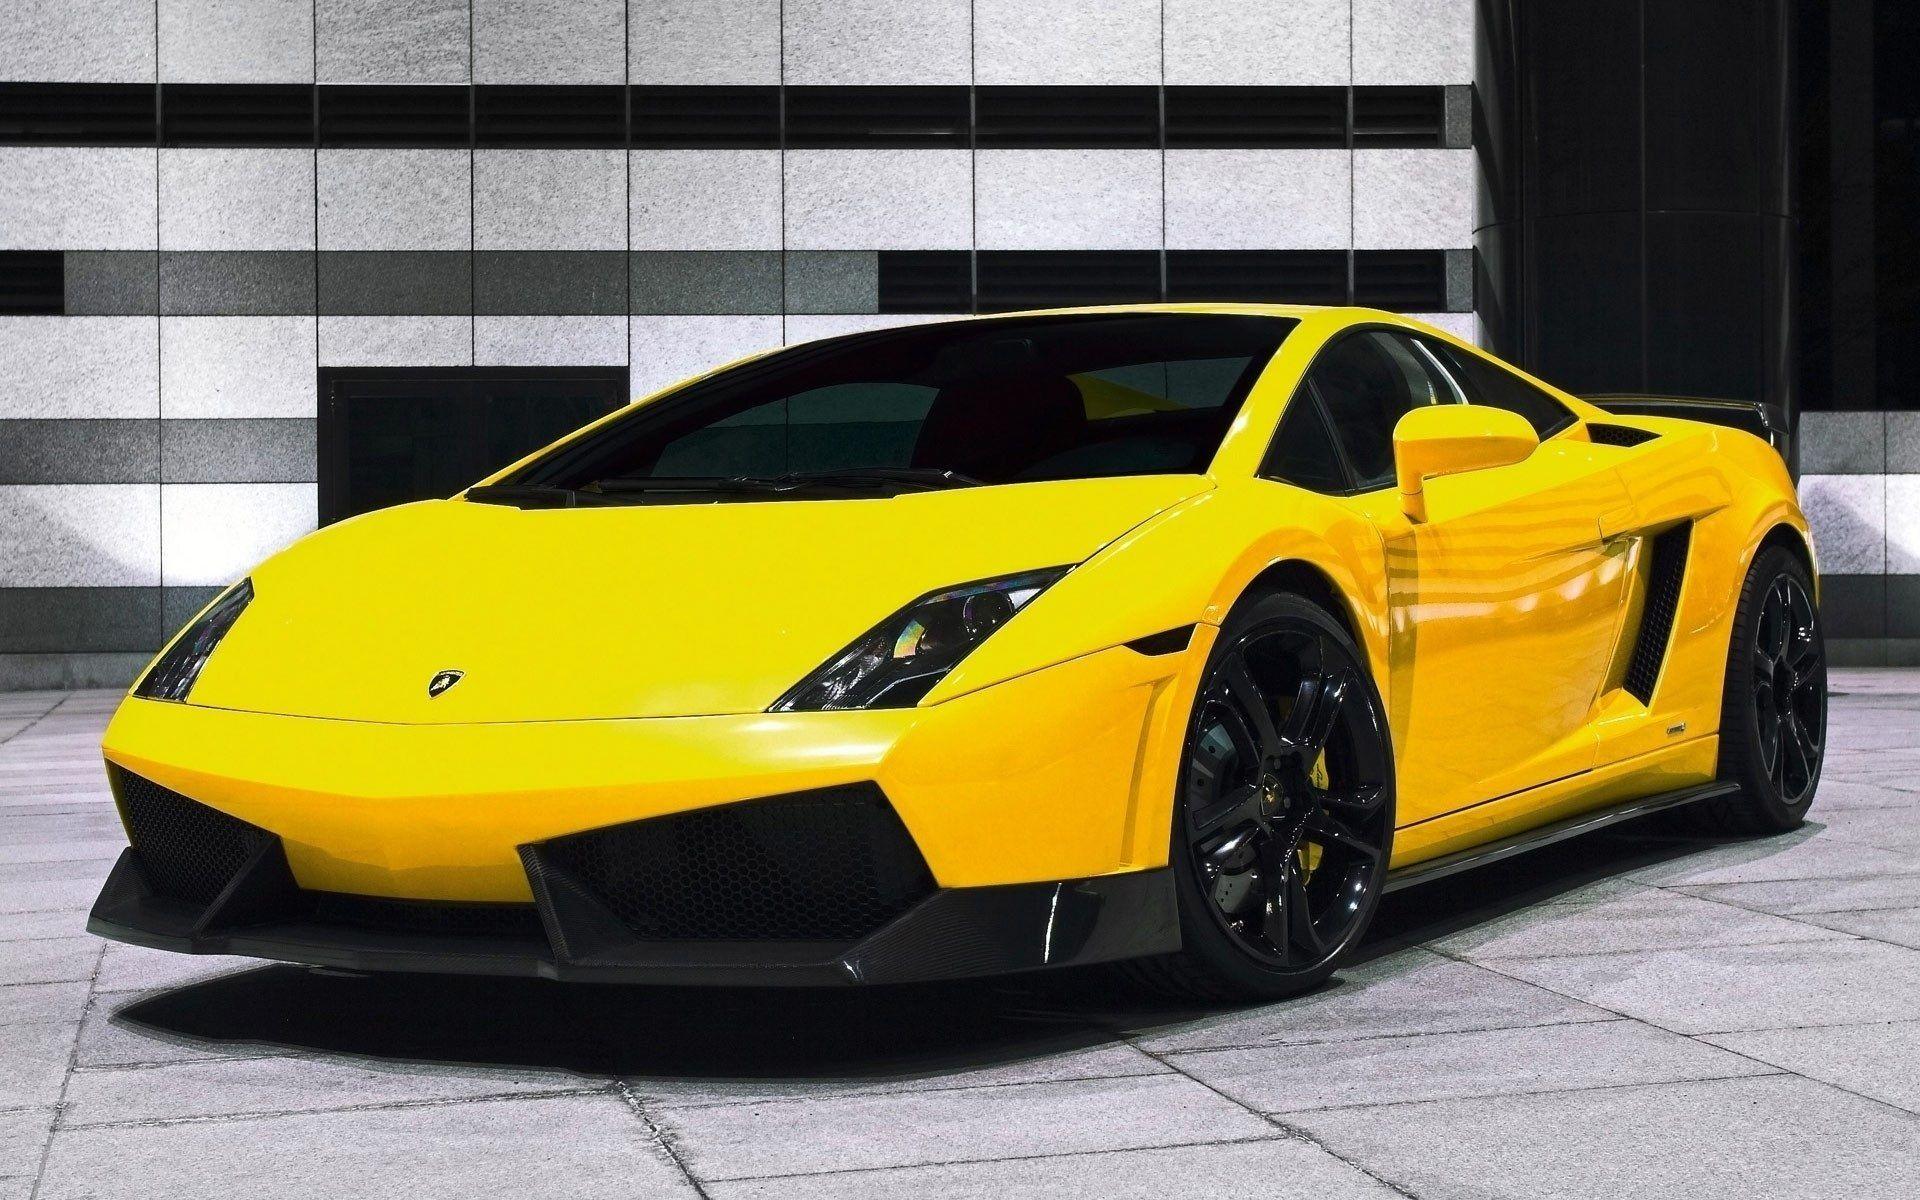 Fond d'écran hd voiture de sport 2 voiture Pinterest